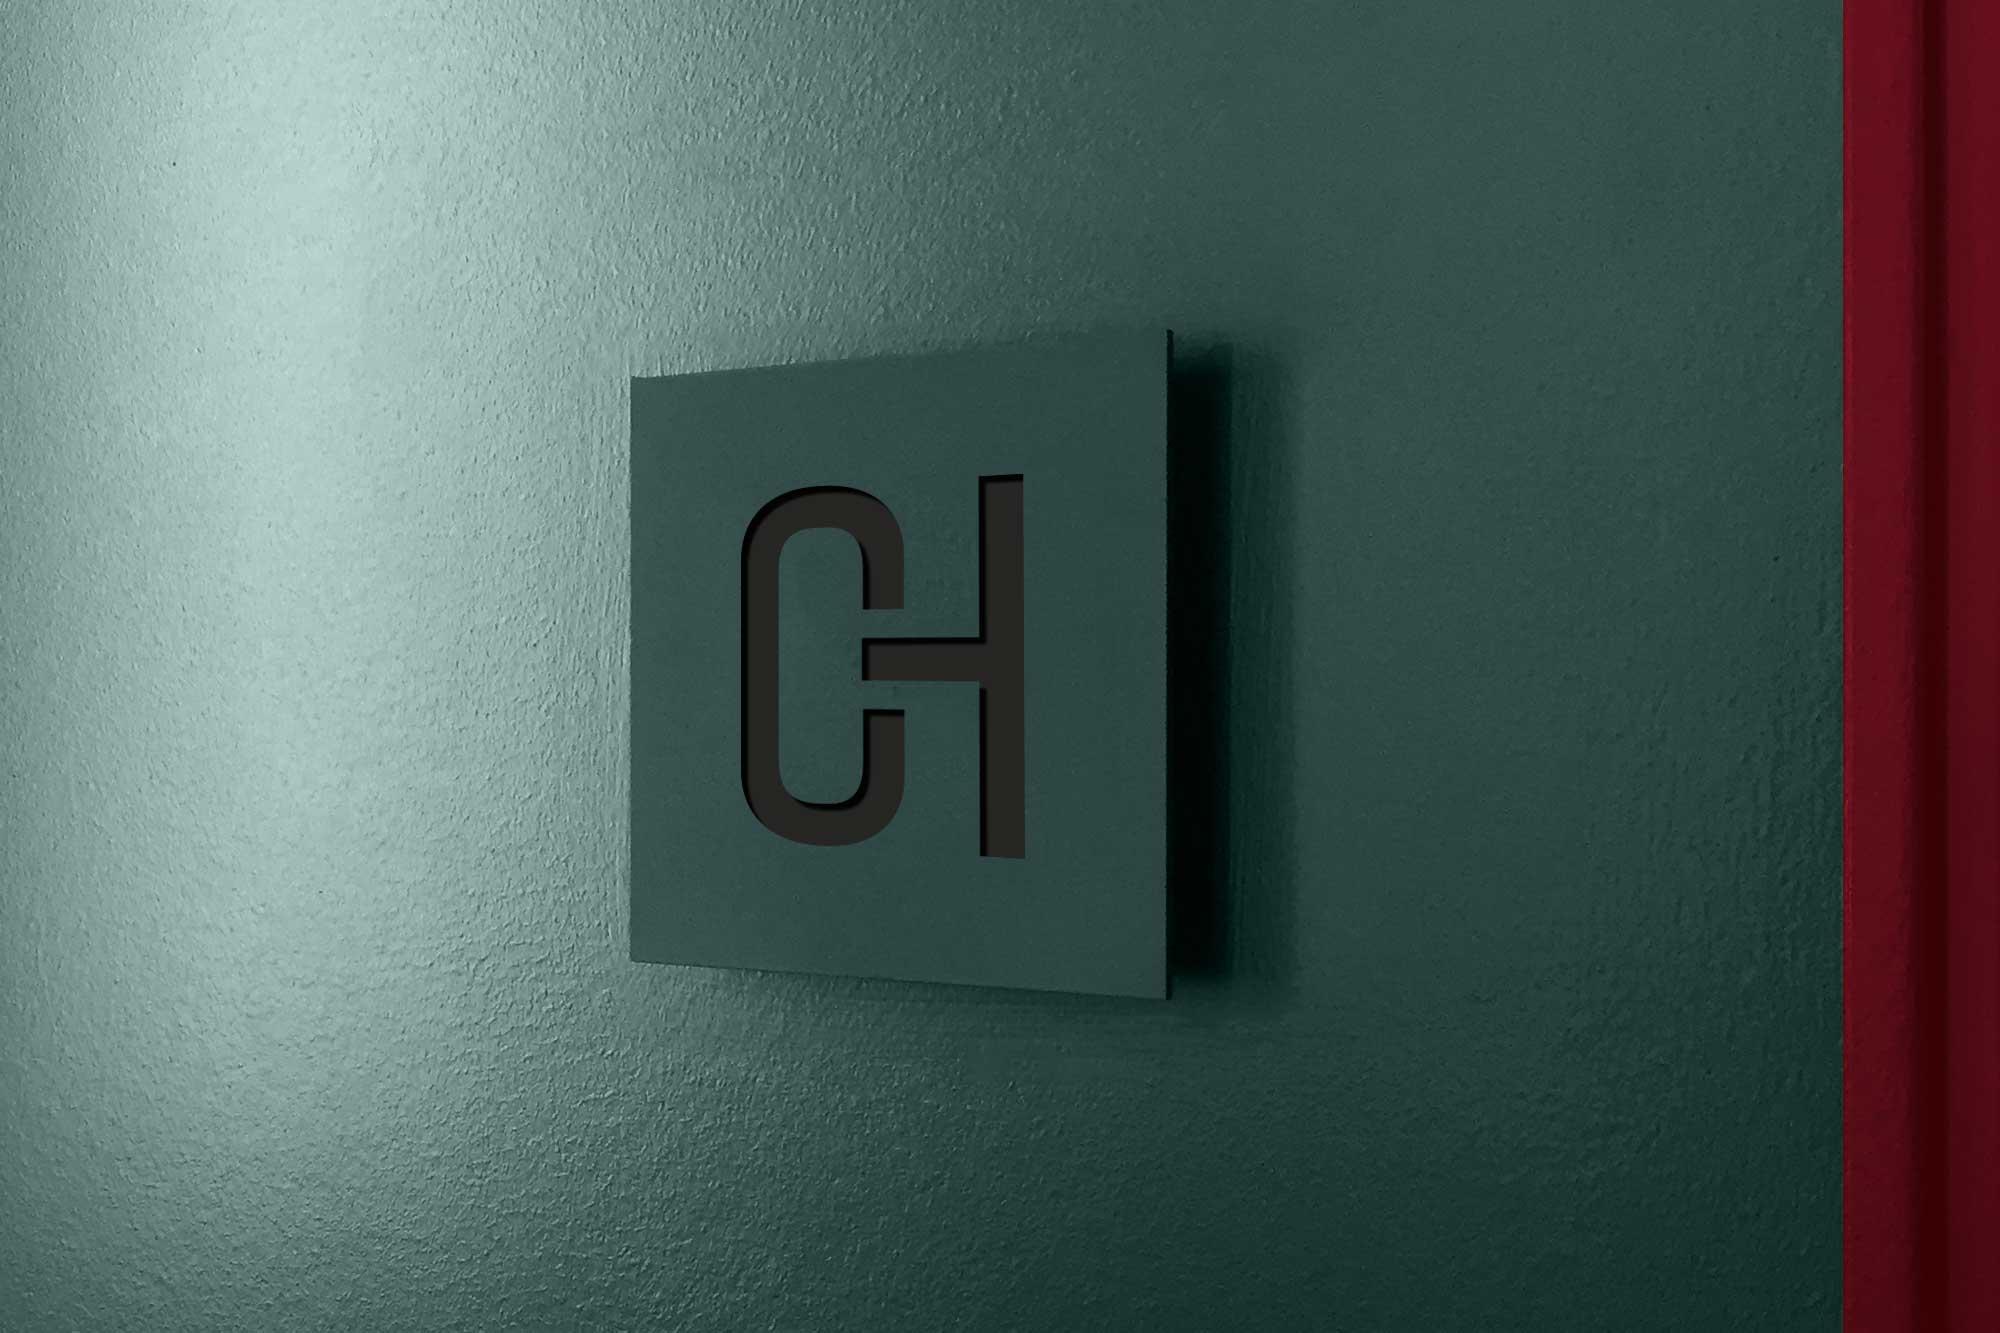 Chbib-Sign-01